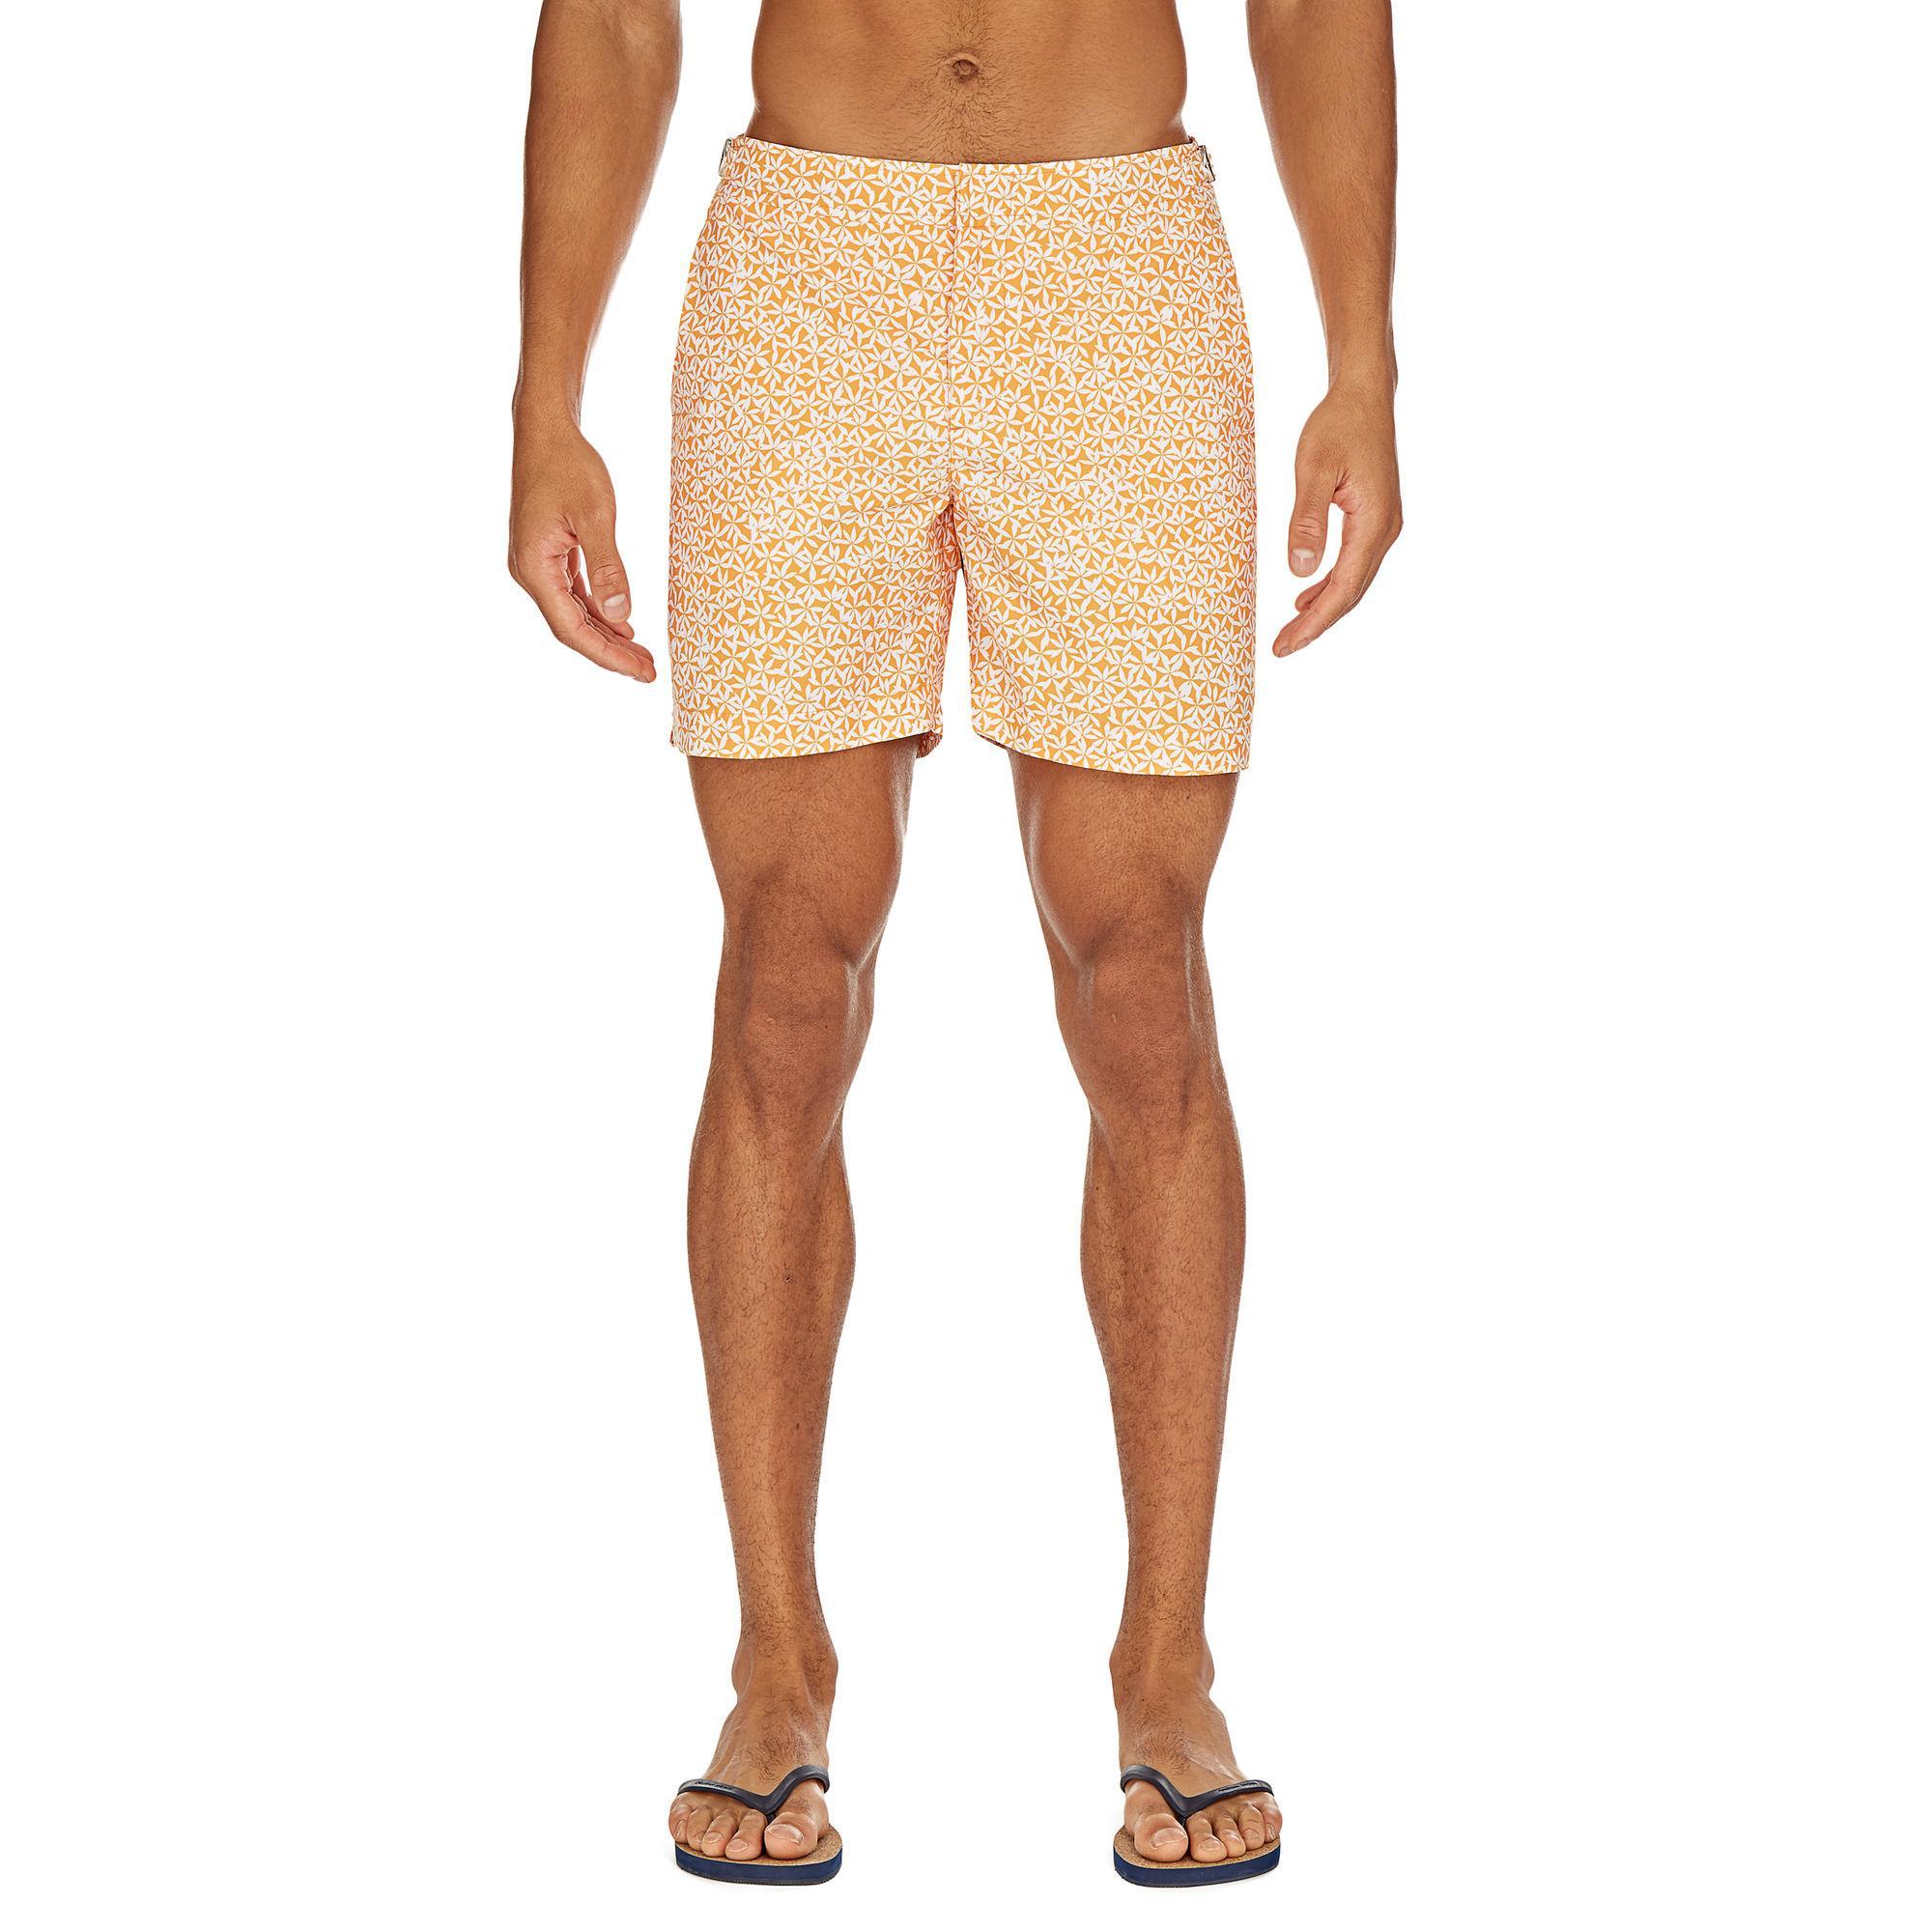 a5ccd225dc Orlebar Brown - Multicolor Bulldog Foglia Tangerine Mid-length Swim Shorts  for Men - Lyst. View fullscreen